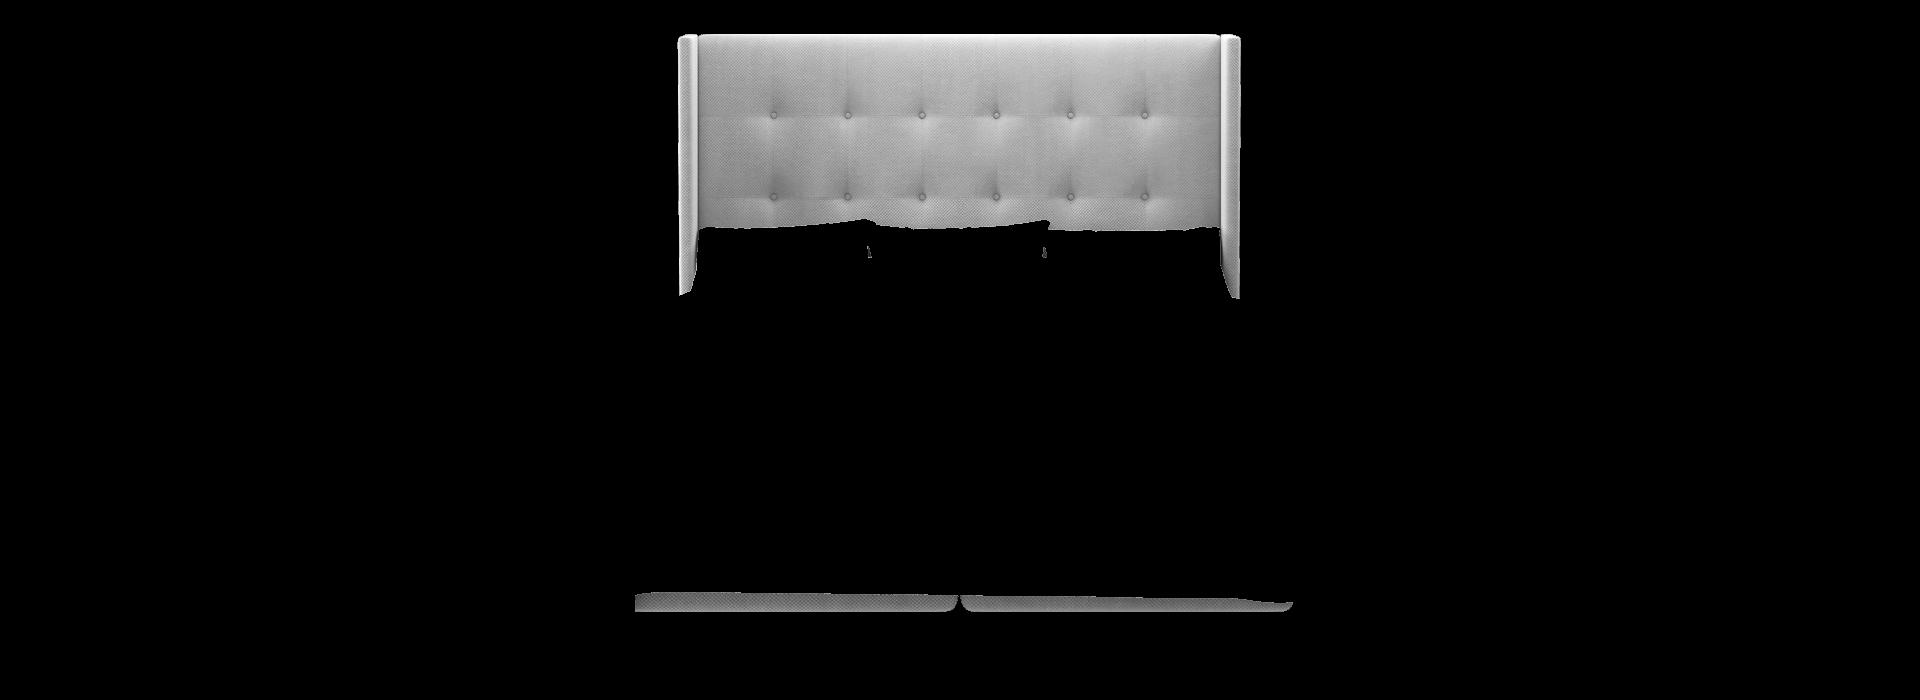 Грета 1.6 ліжко box spring - маска 1